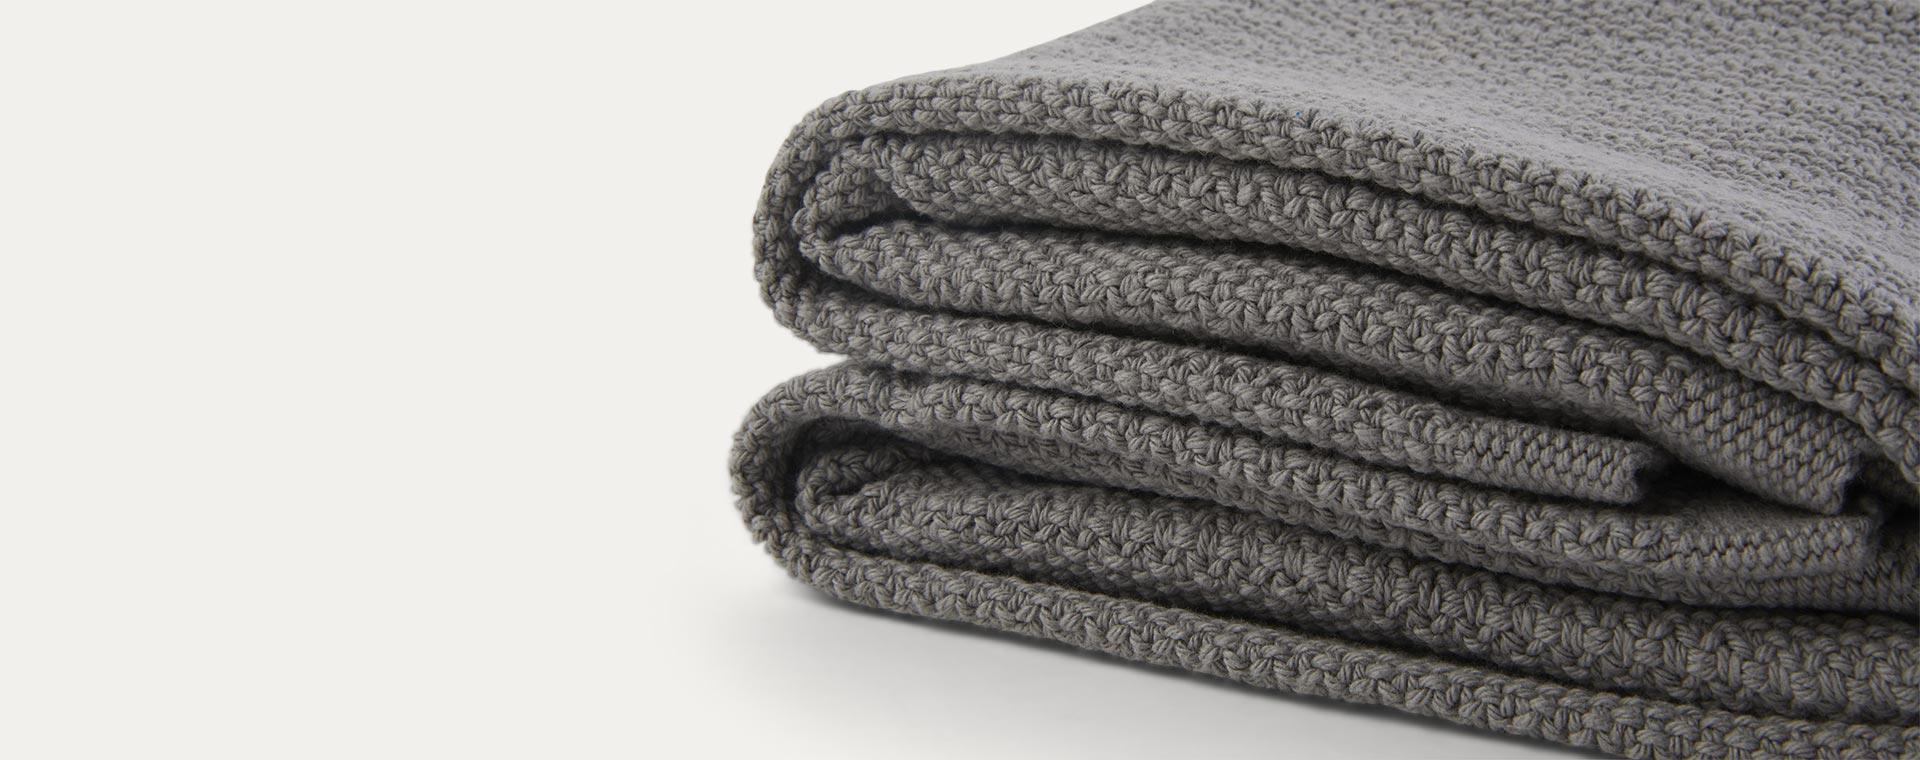 Slate Grey Hippychick Cellular Baby Blanket